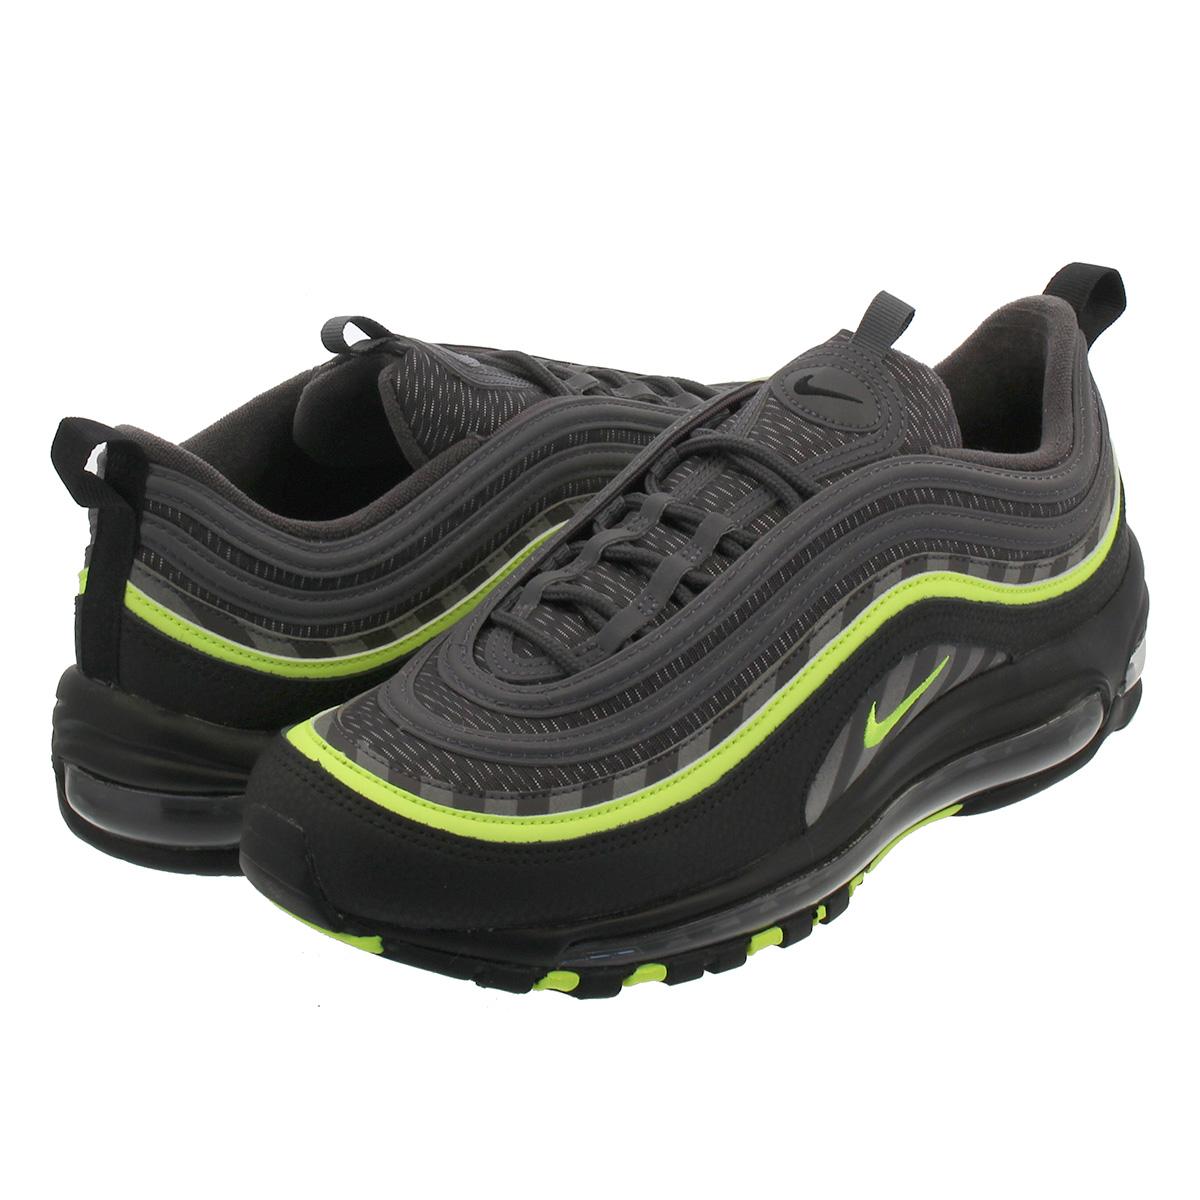 Nike AIR MAX 97 Men's Shoes Shoes 60items | Rakuten